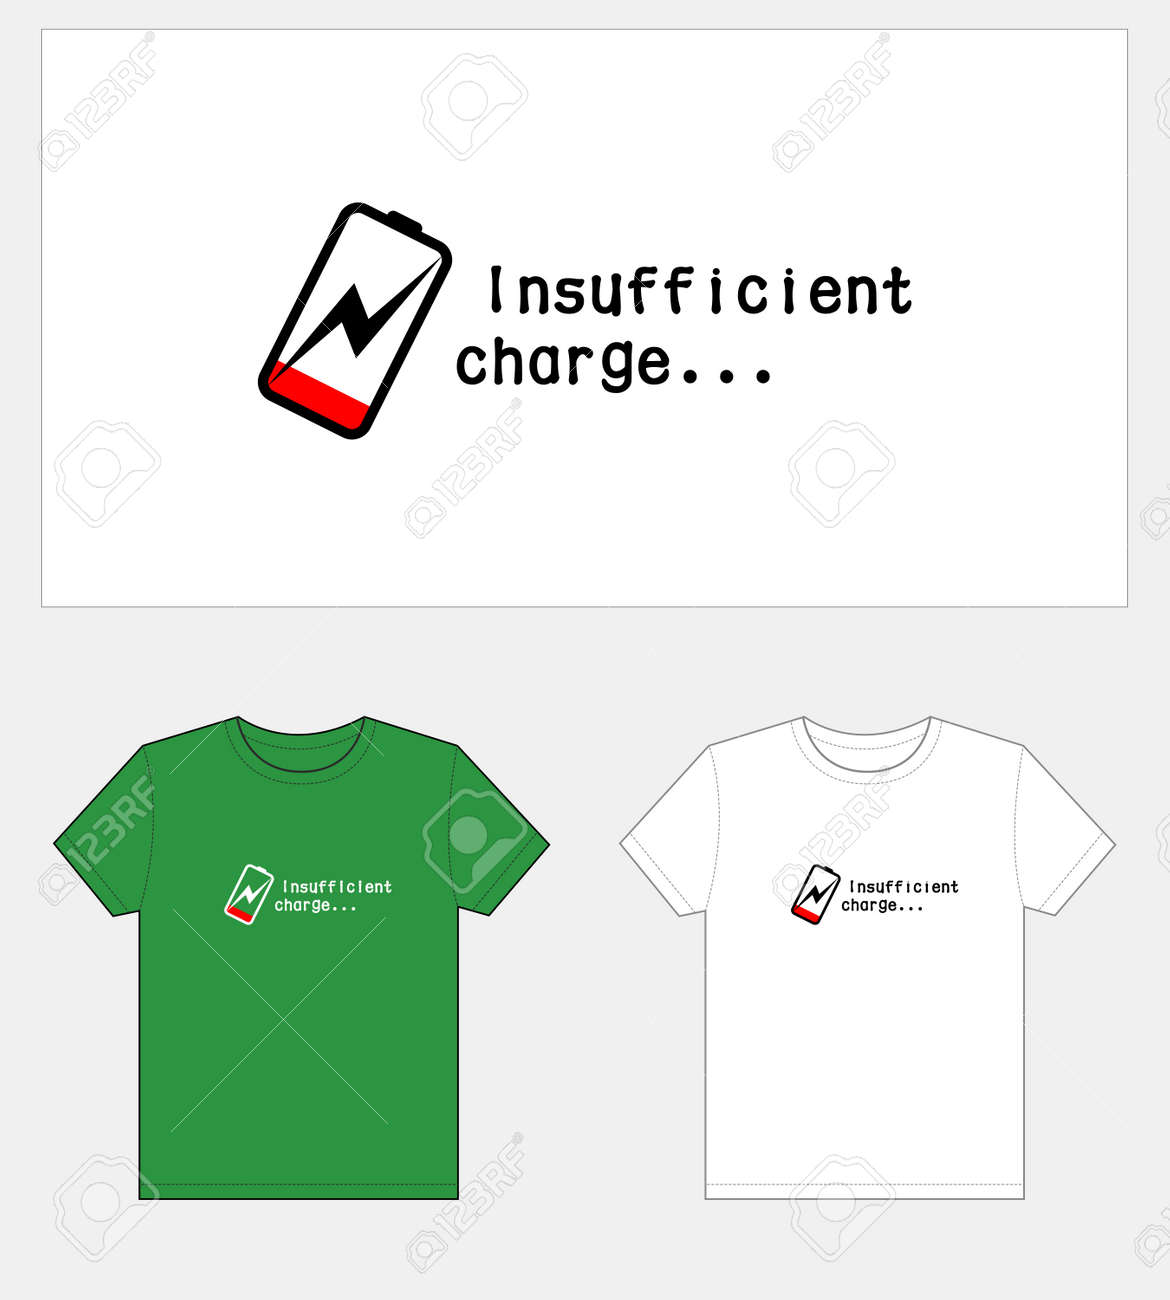 Low power, T-shirt graphic design. - 170928244